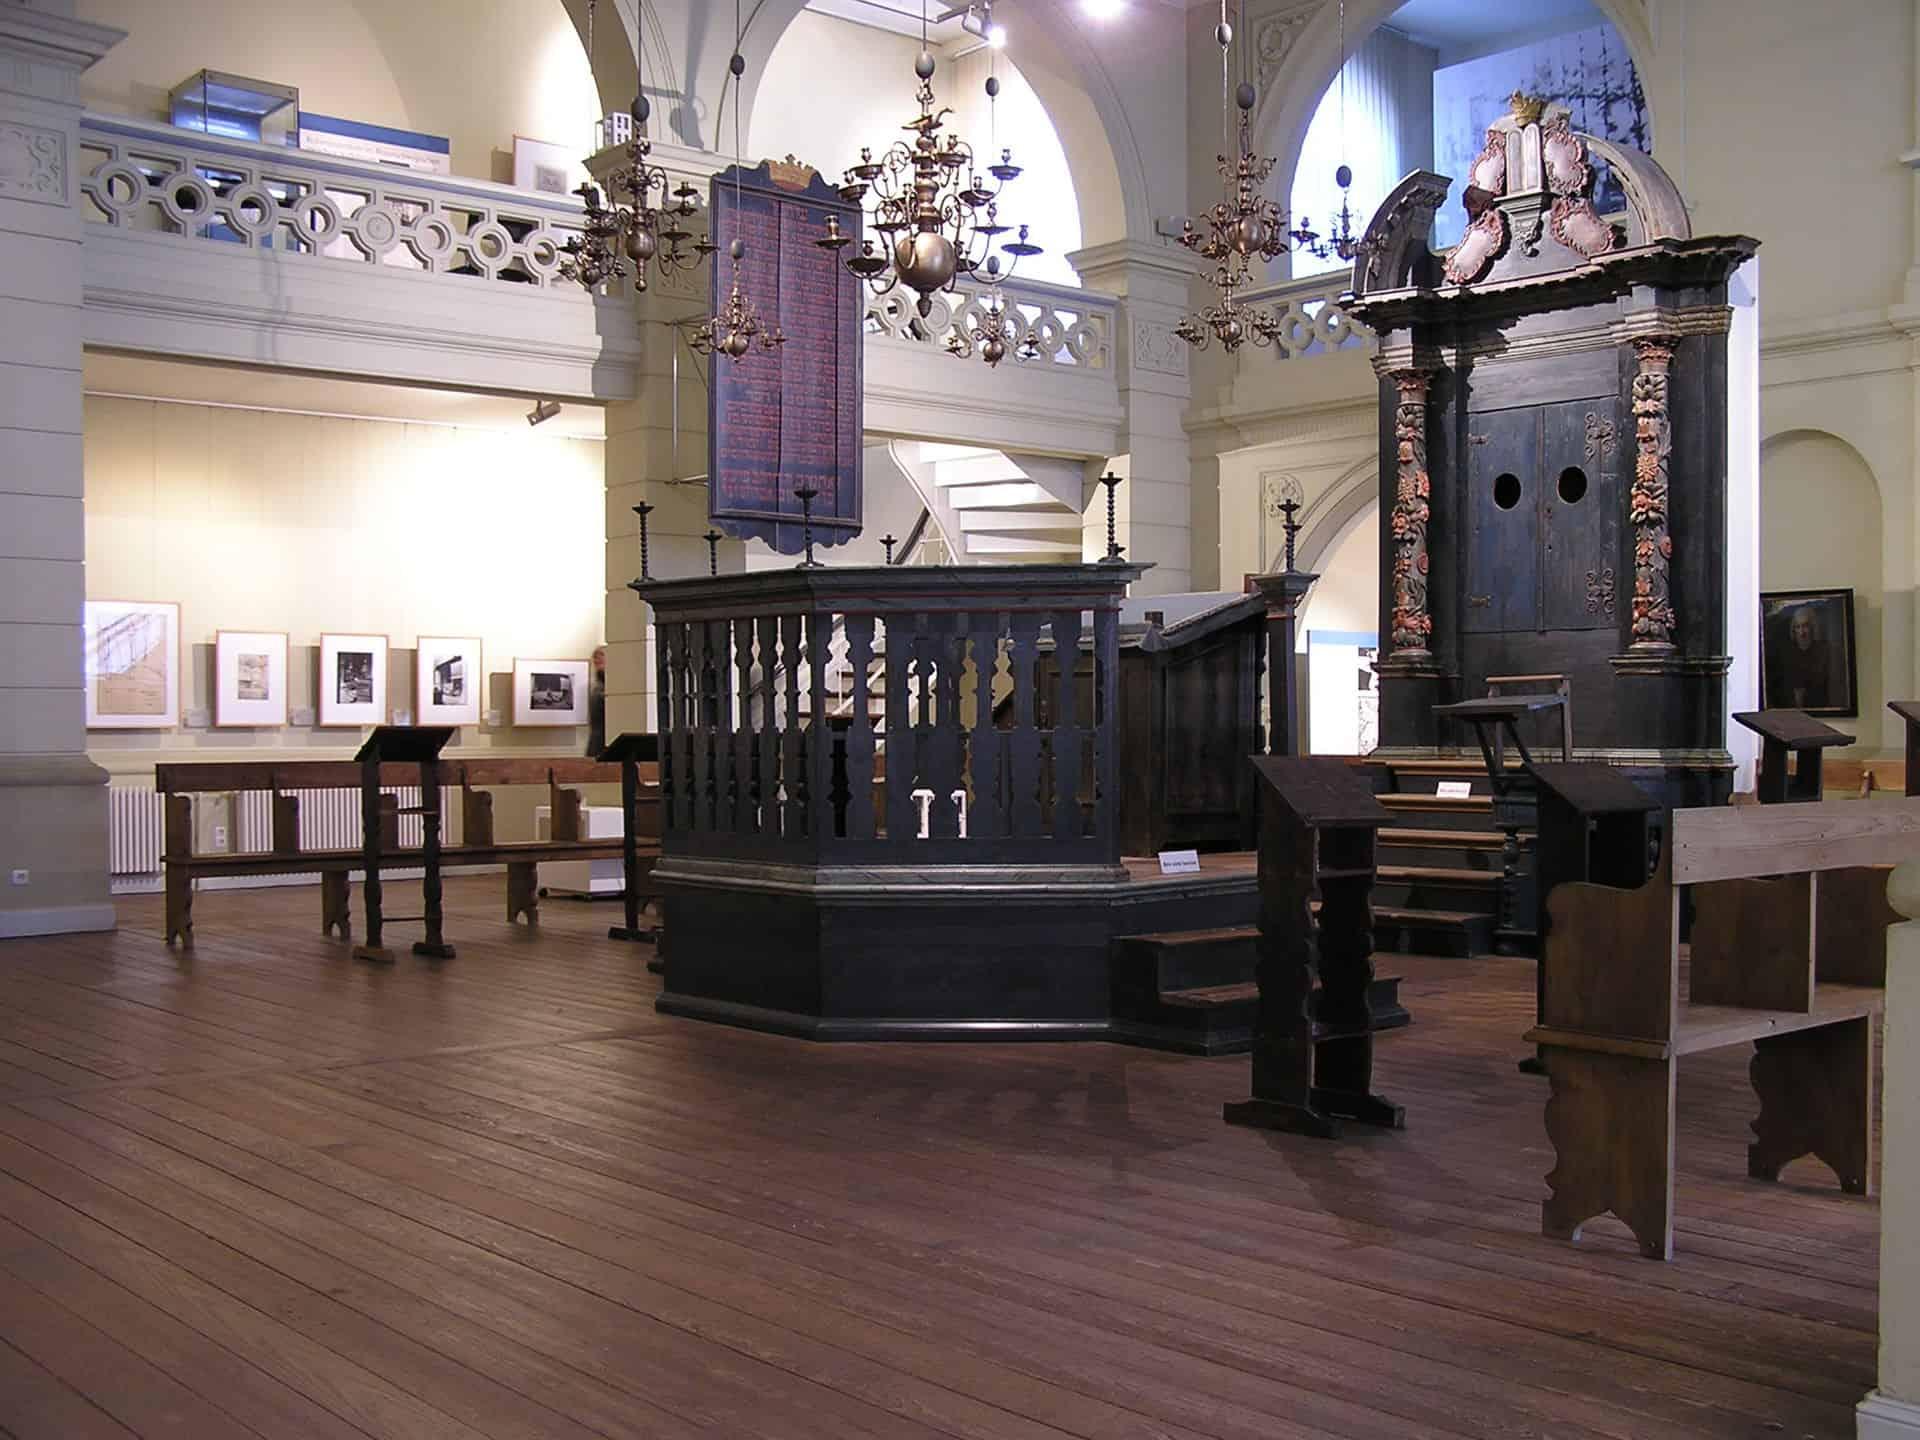 museum der religionen als ort der toleranz der l we. Black Bedroom Furniture Sets. Home Design Ideas